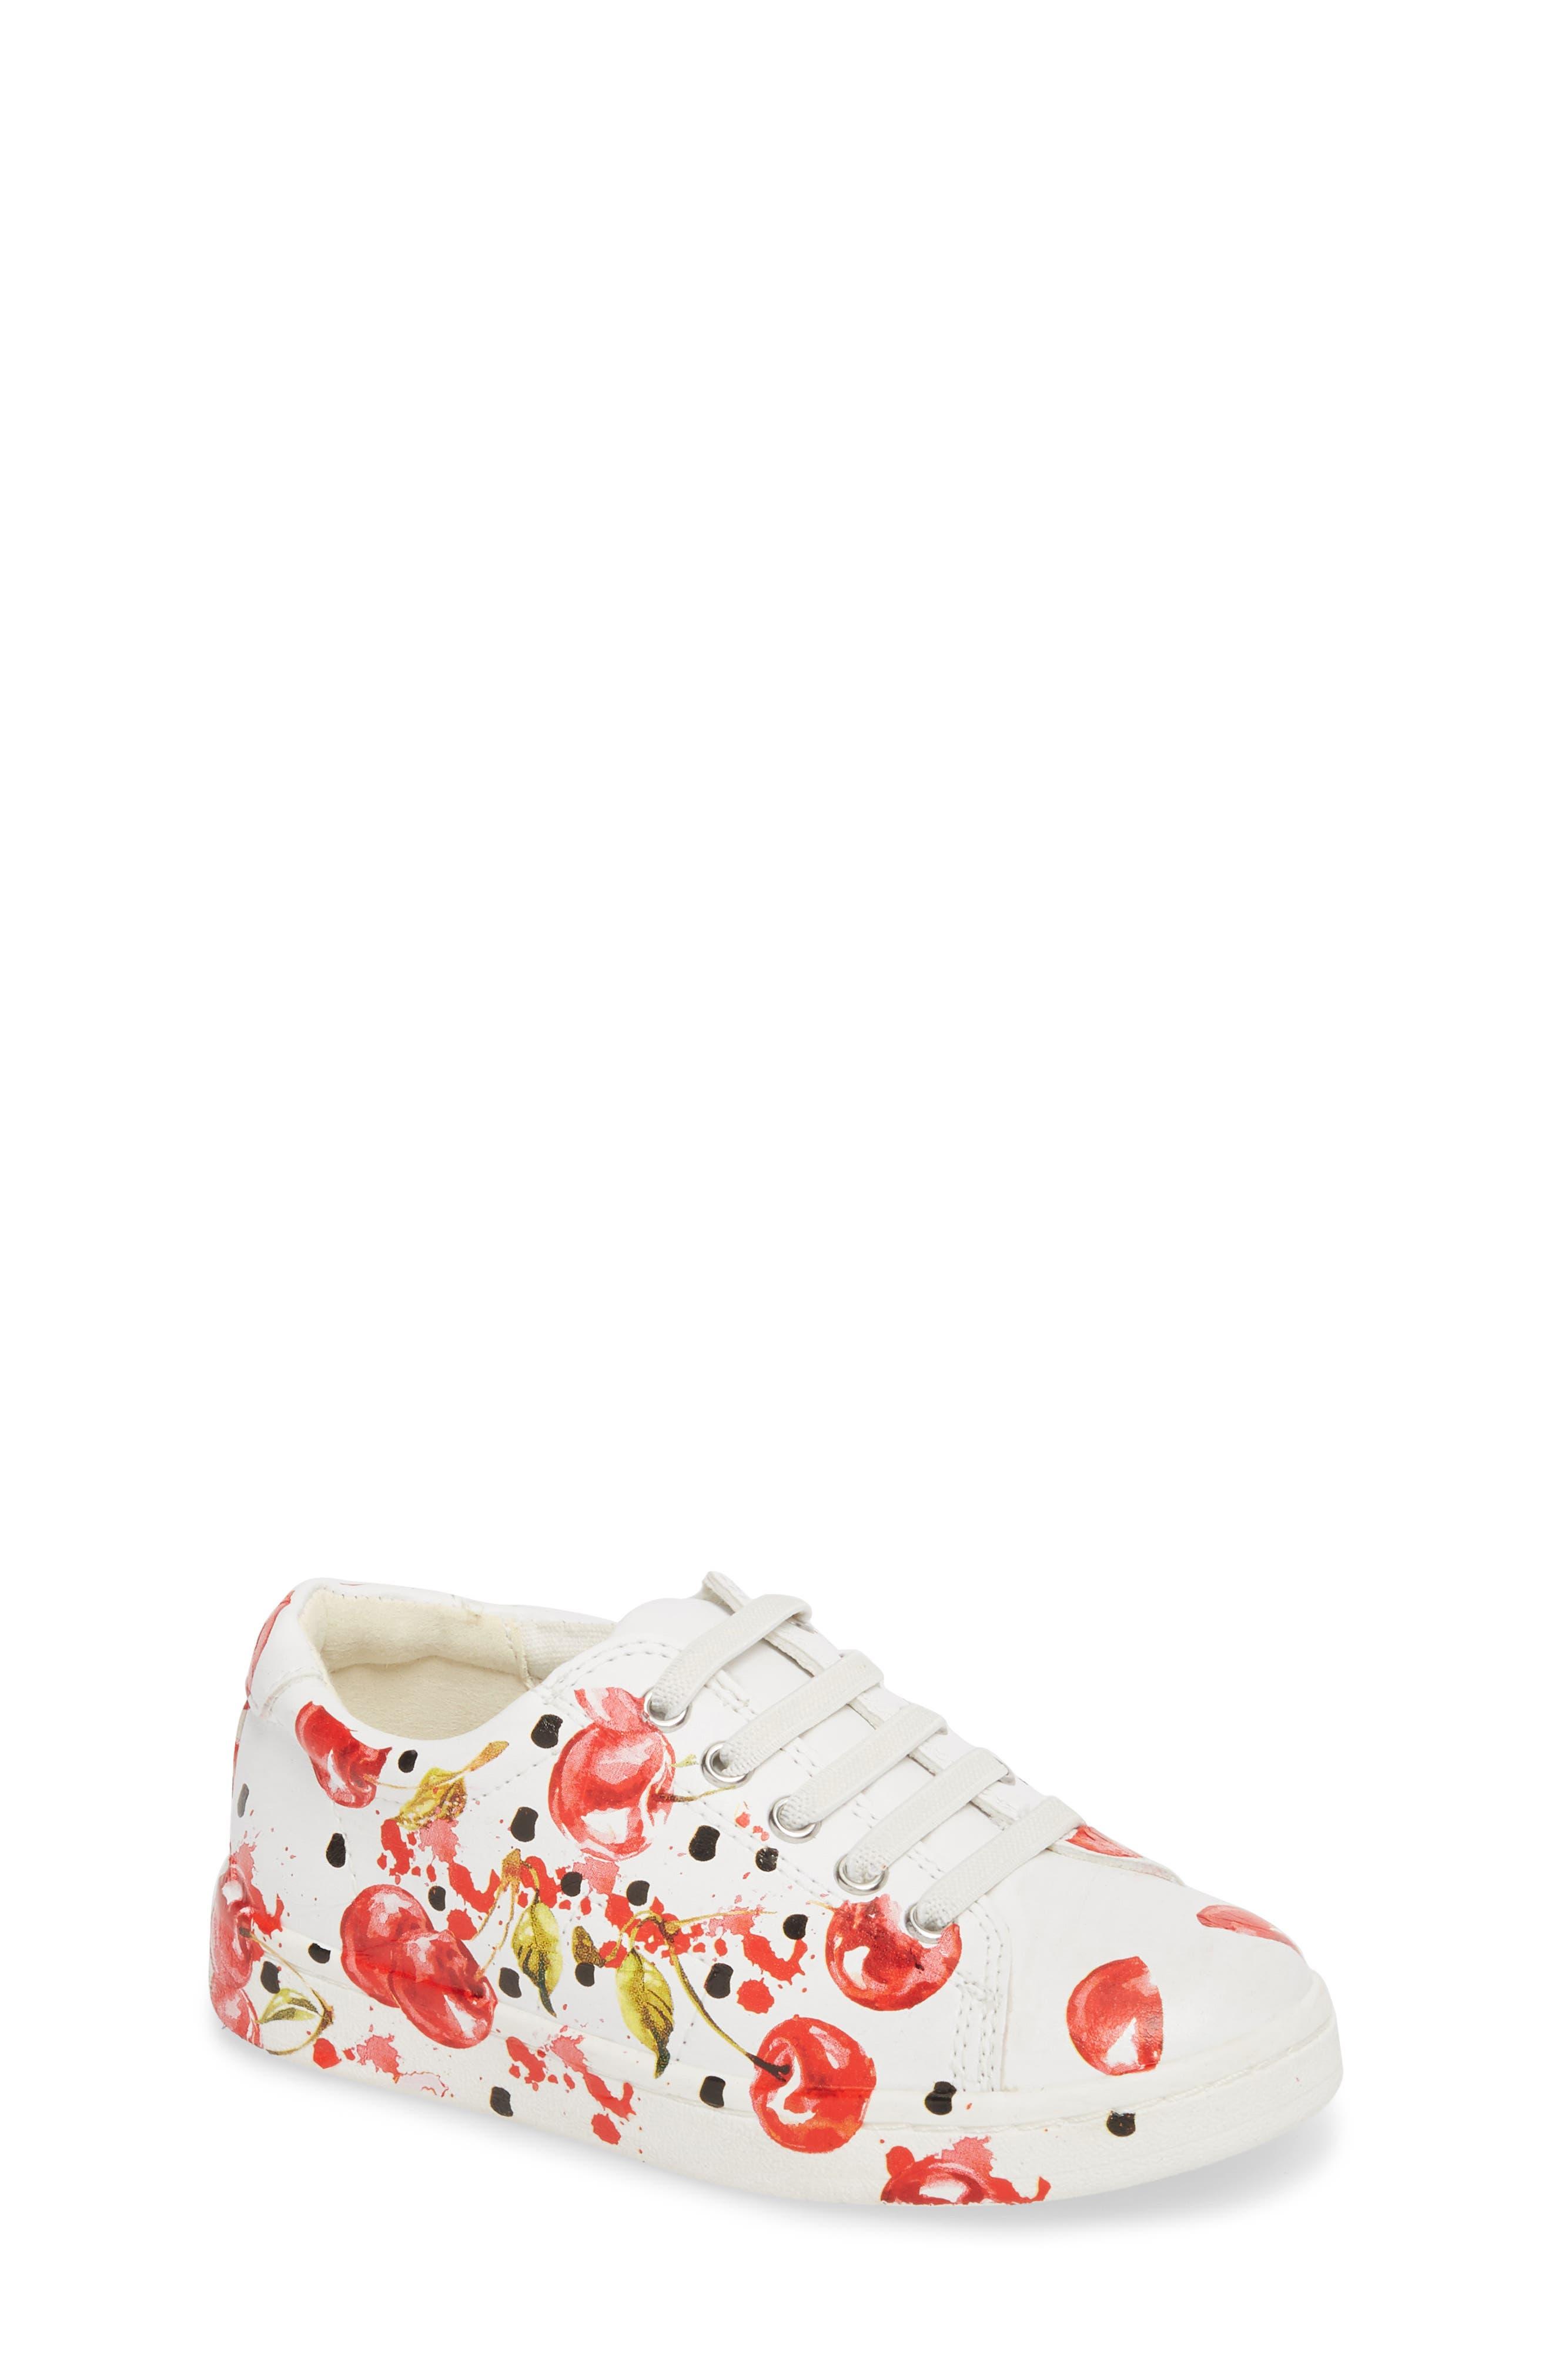 Blane Milford Fruit Print Sneaker,                             Main thumbnail 1, color,                             White/ Cherry Faux Leather